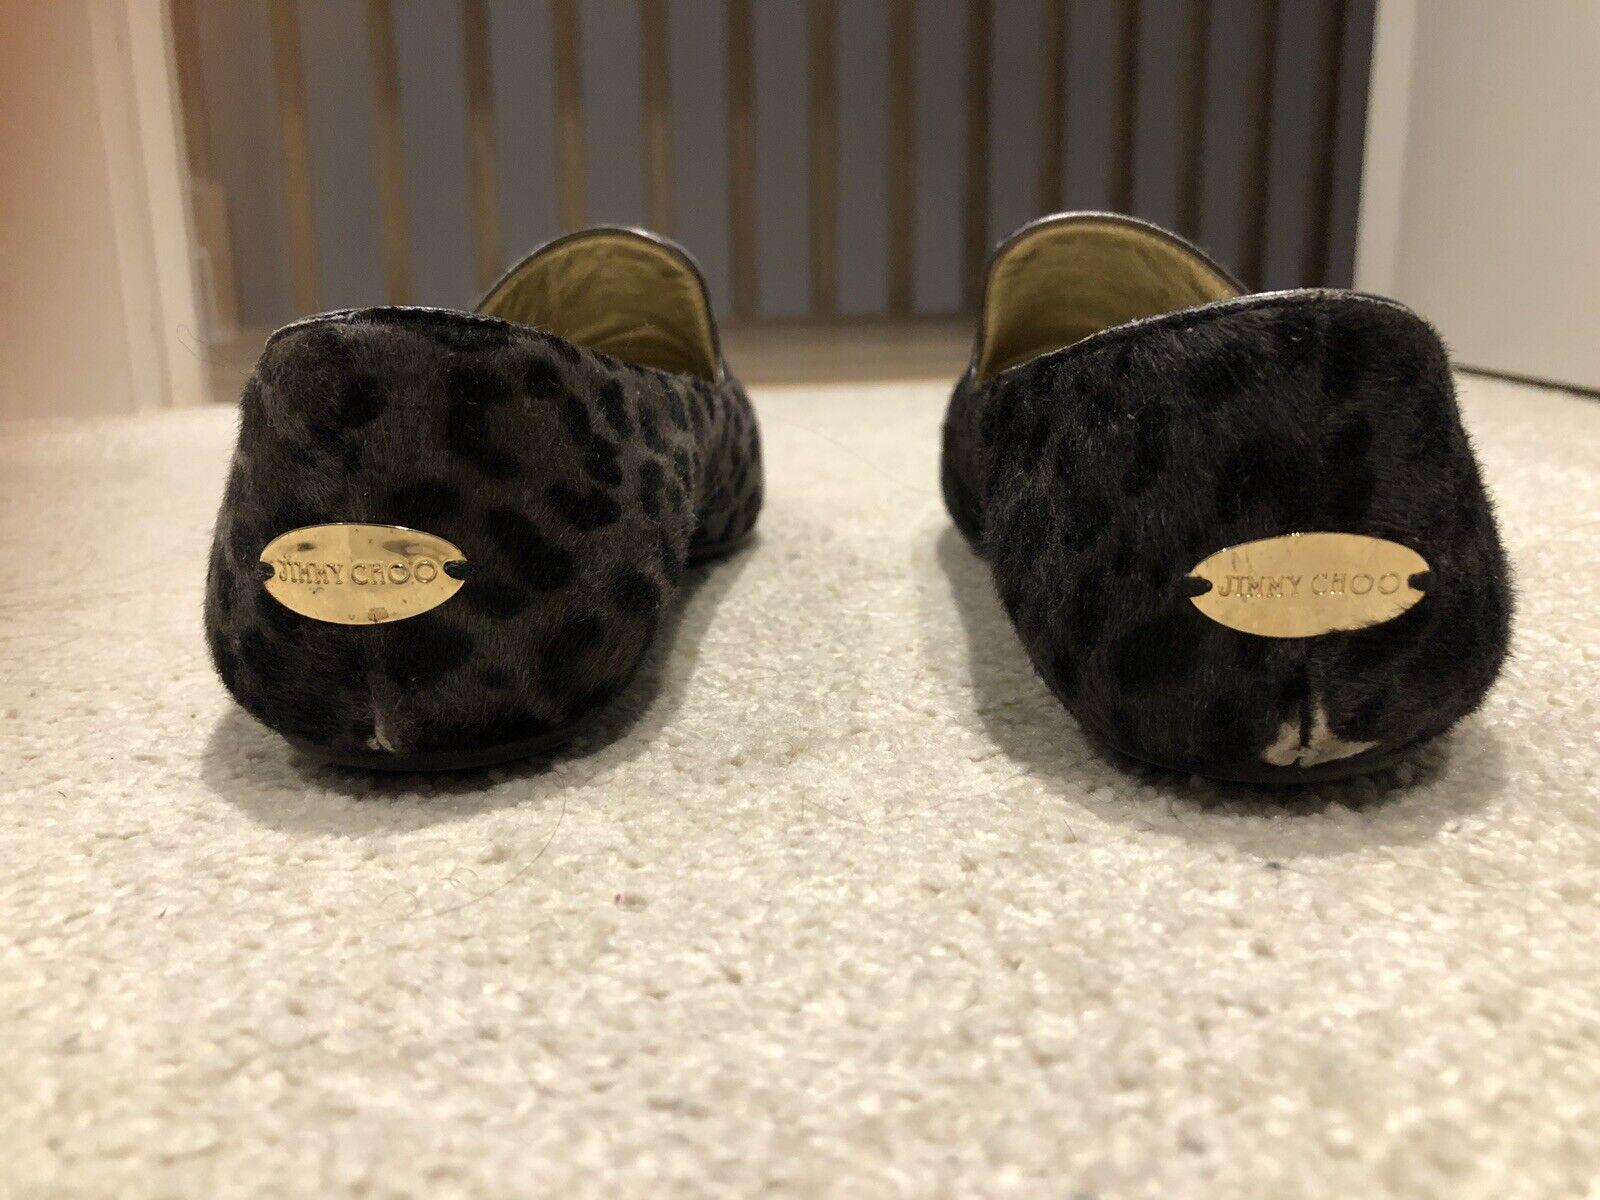 Jimmy Choo Loafer.  Size 36.5.  Leopard Print Style.